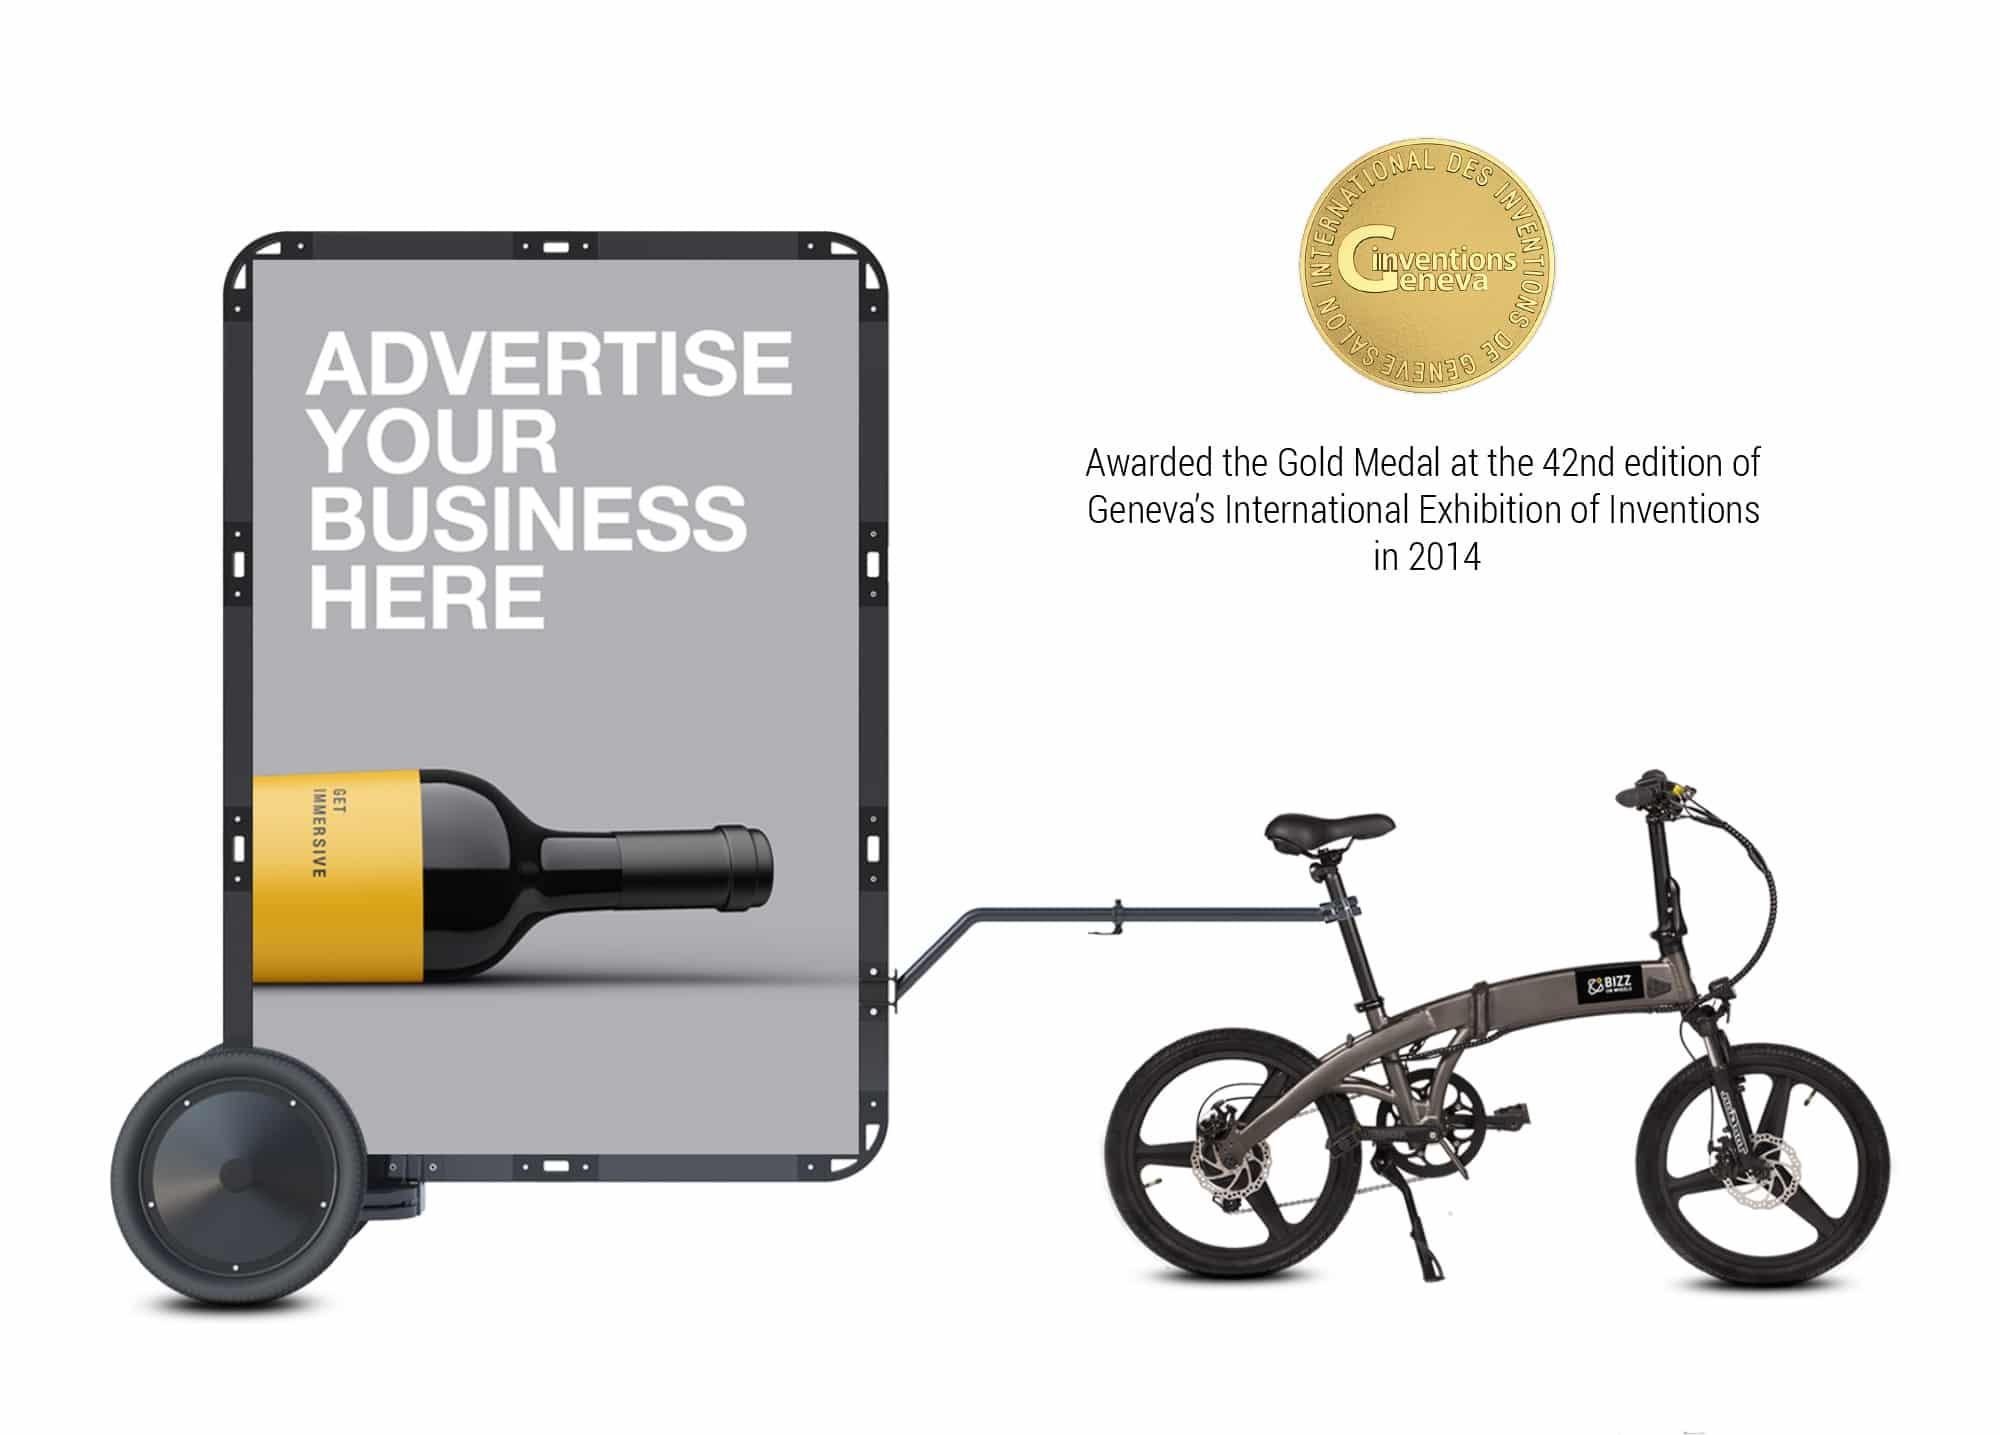 AdBicy mobile billboard and advertising bike trailer